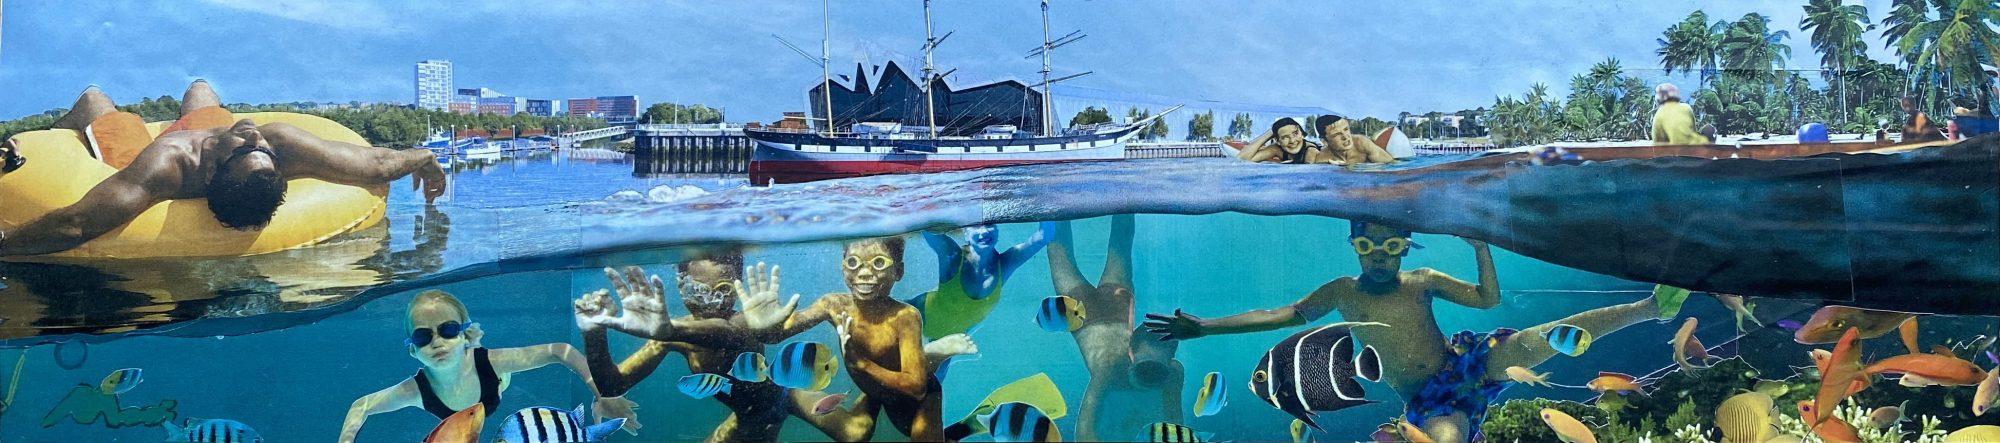 Collage 3, by David Mach RA